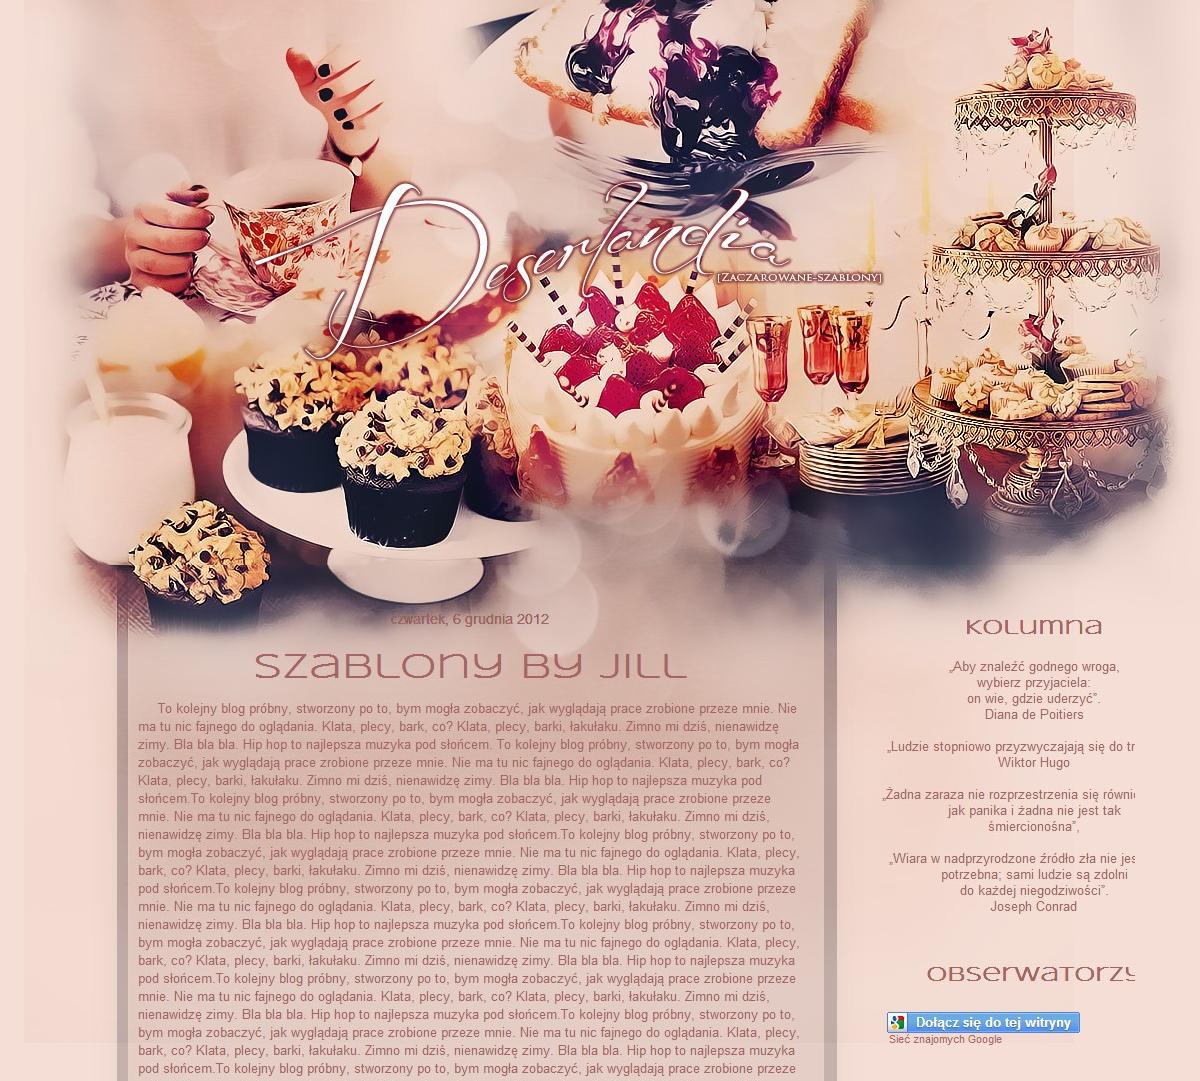 Szablon297 by SzablonyJill